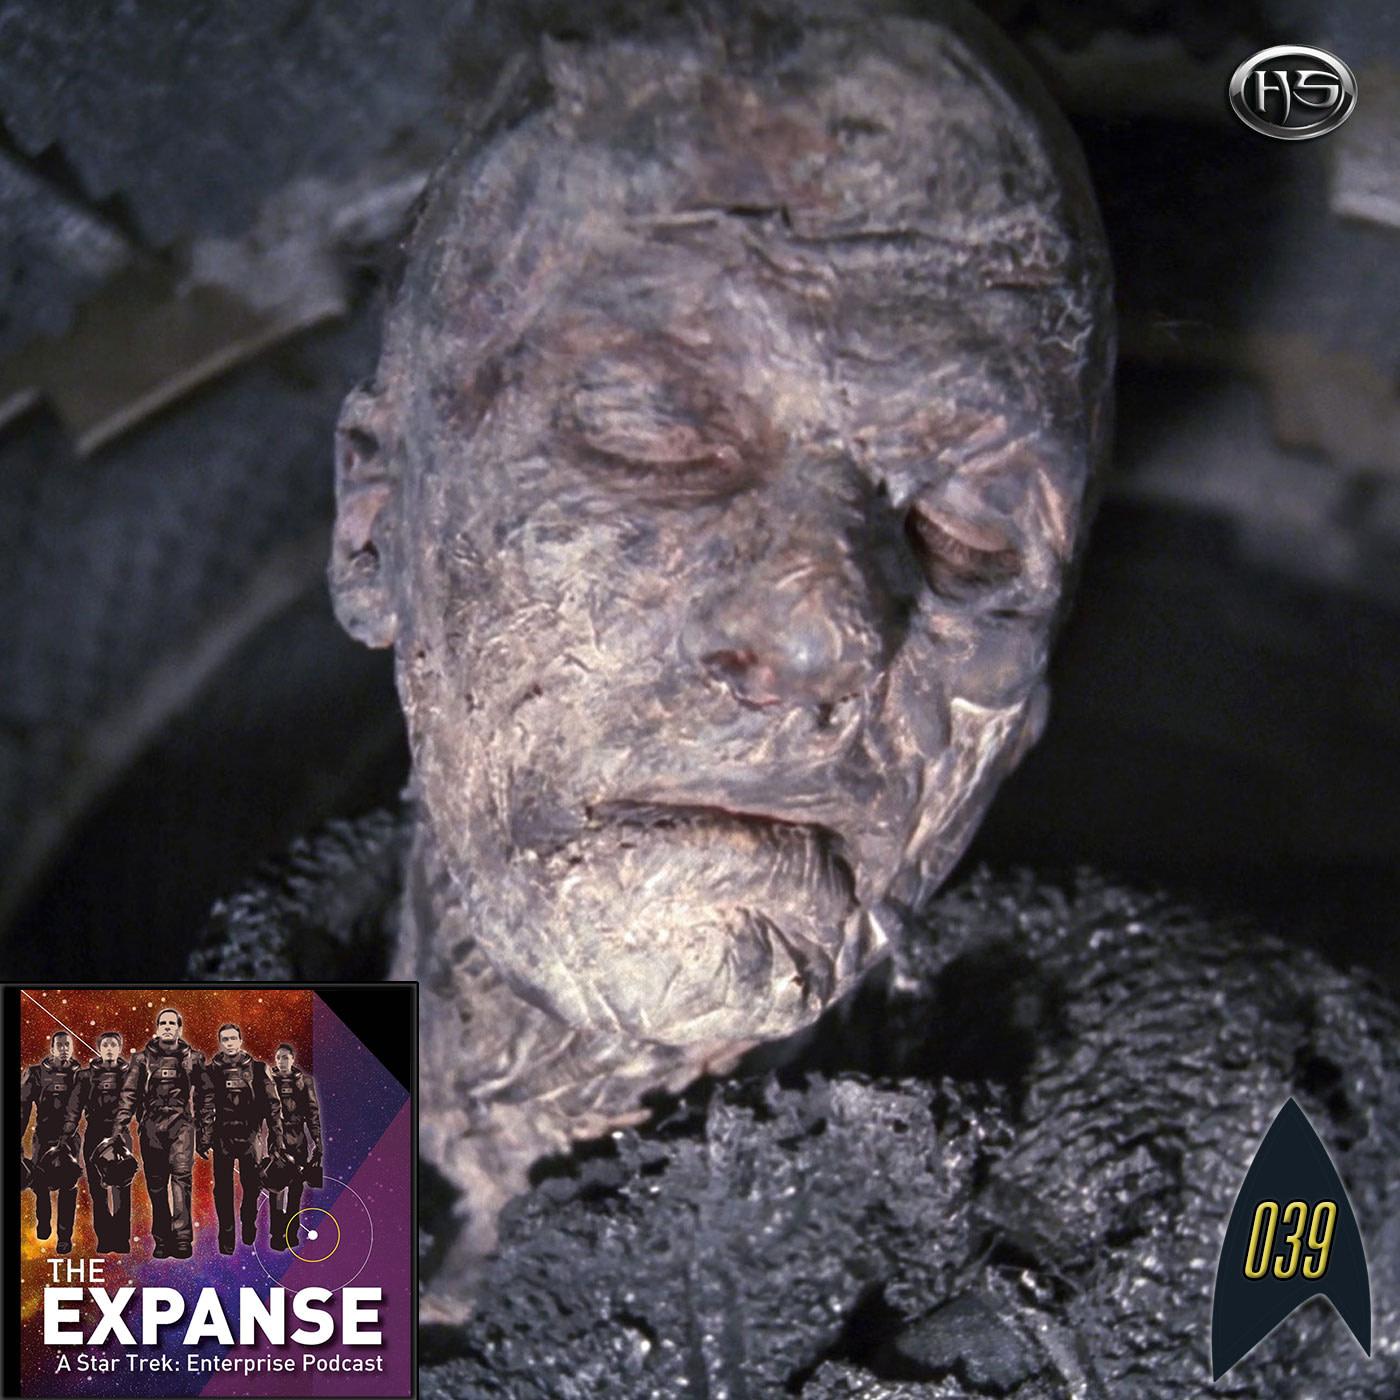 The Expanse Episode 39